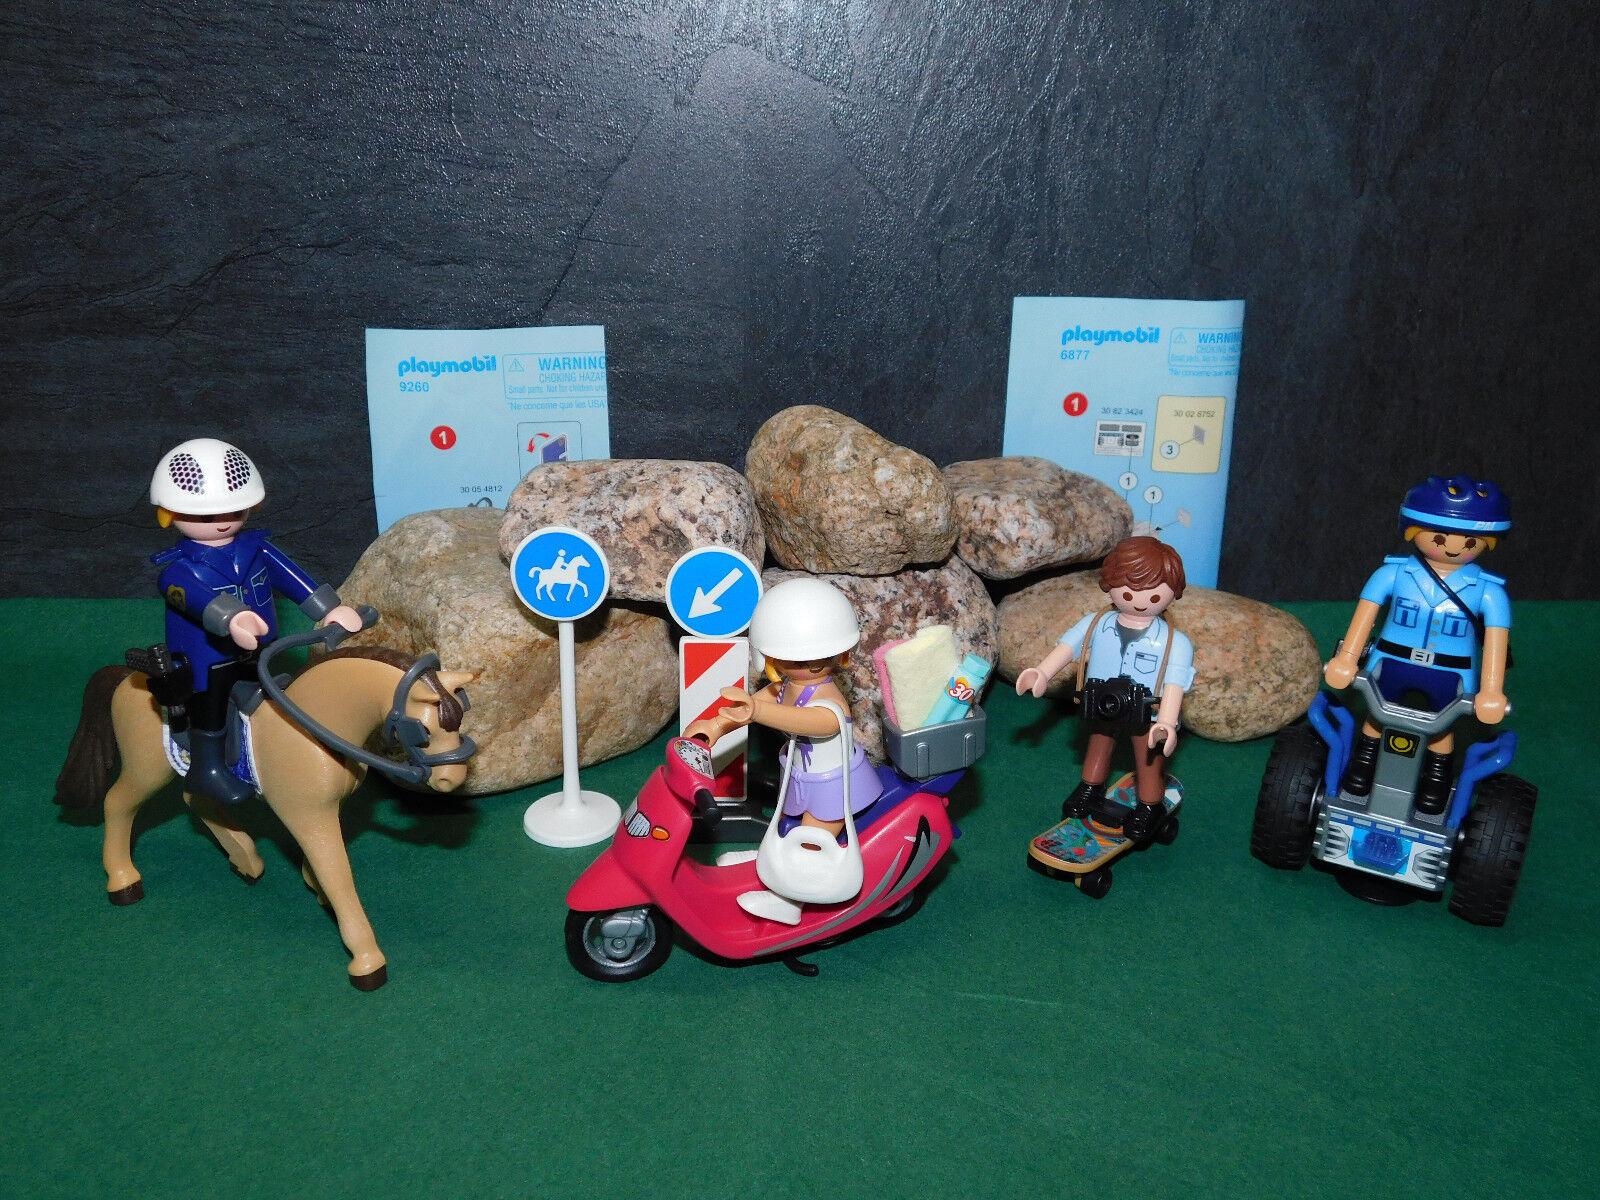 Playmobil Polizisten (9260 u. 6877), Strandgirl (9084) u. OVP Skater, ohne OVP u. afc14c